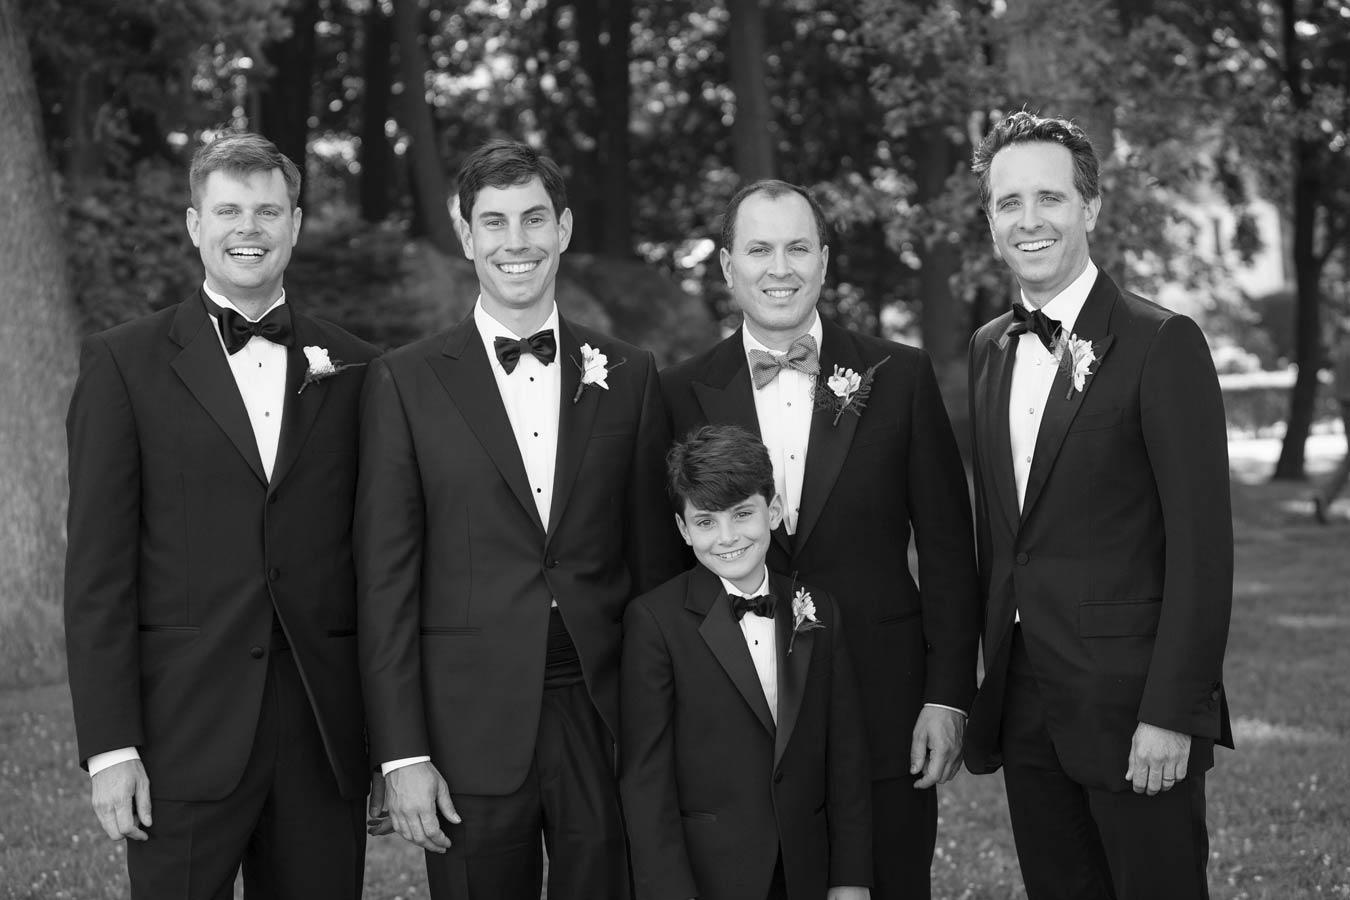 larchmont-yacht-club-wedding-westchester0004.jpg